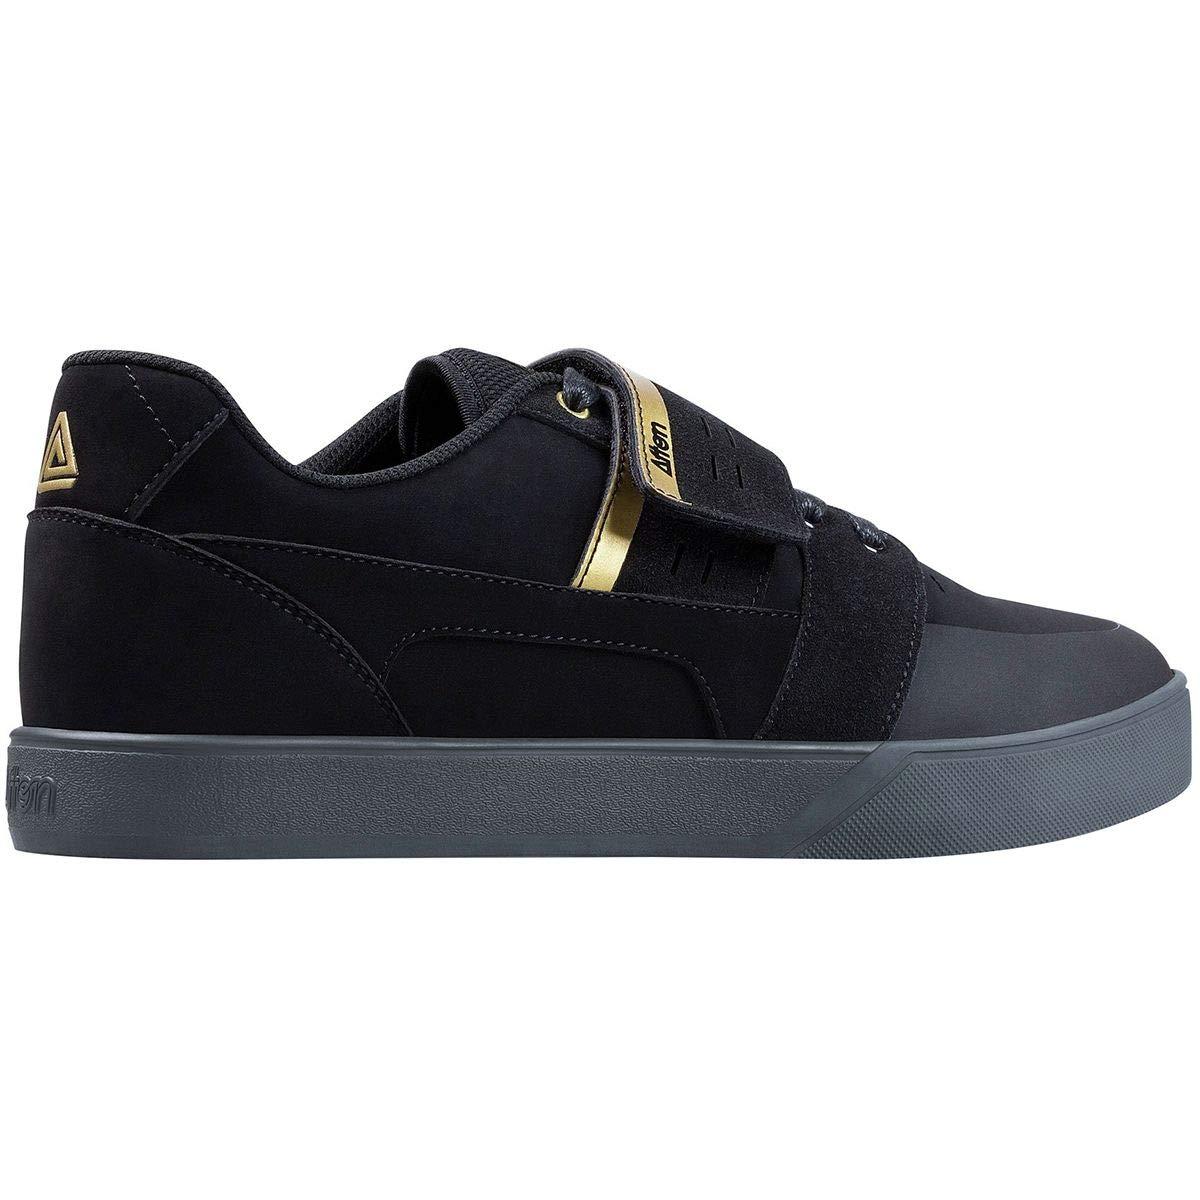 Afton schwarz Gold Vectal MTB Schuh